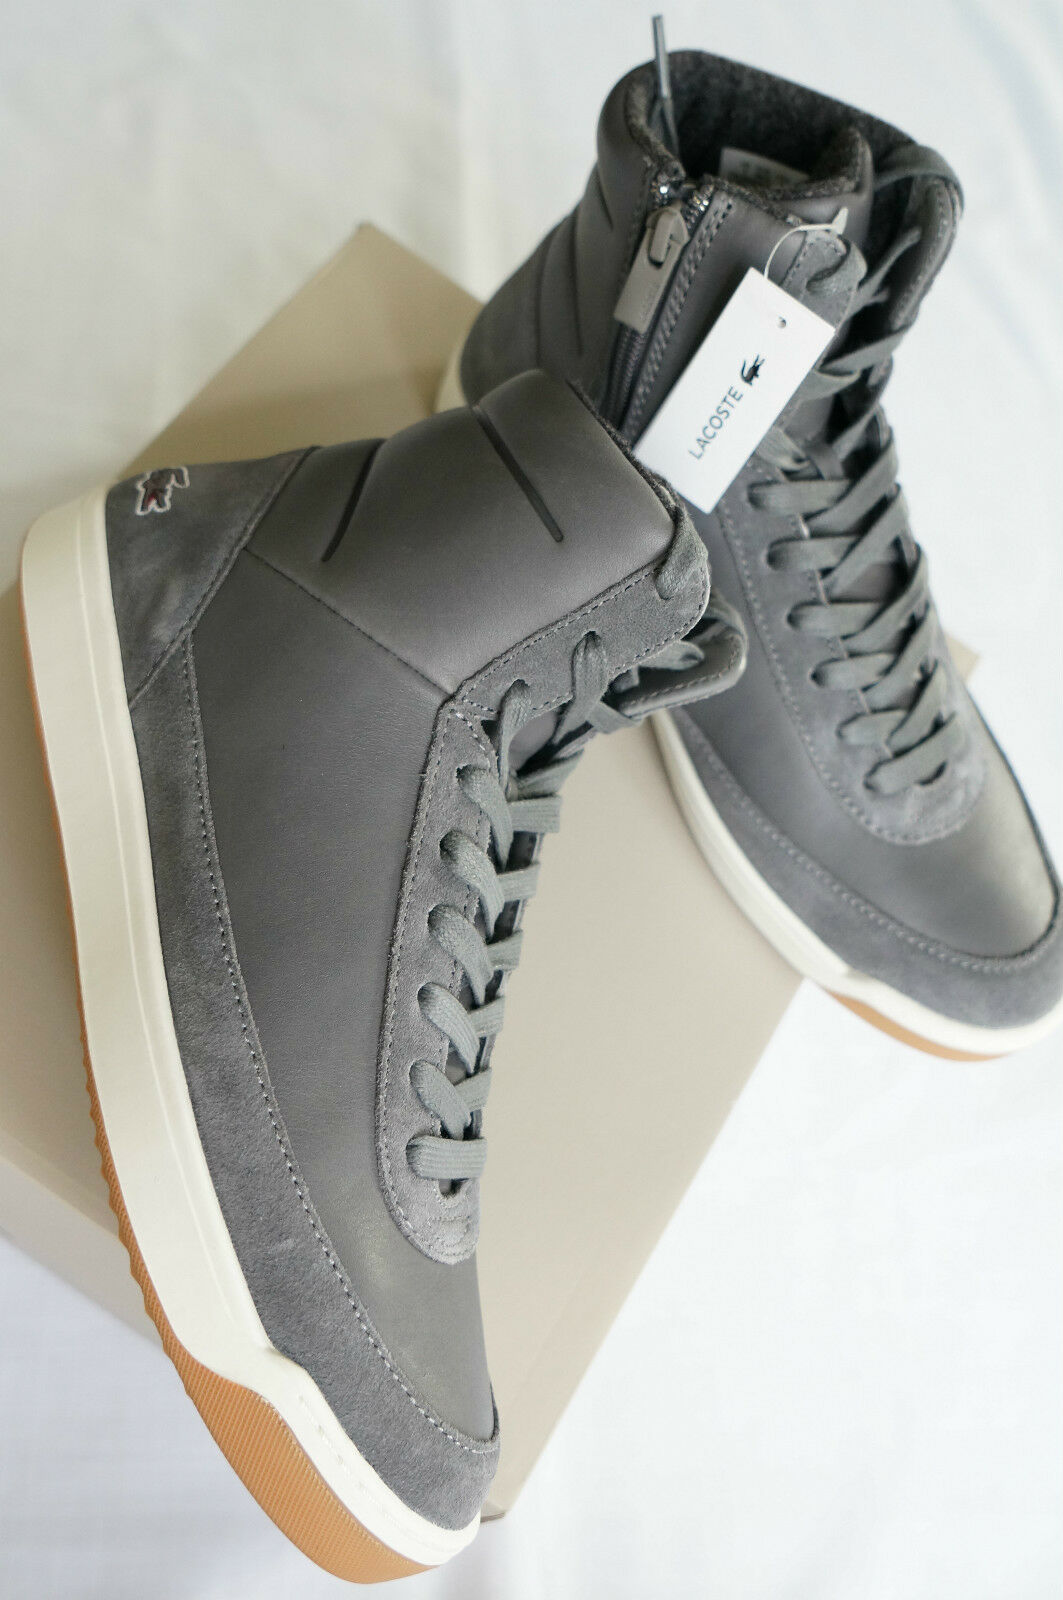 * Lacoste Damen Explorateur Calf 316 2 High-Top Sneakers Stiefelette Gr. 42